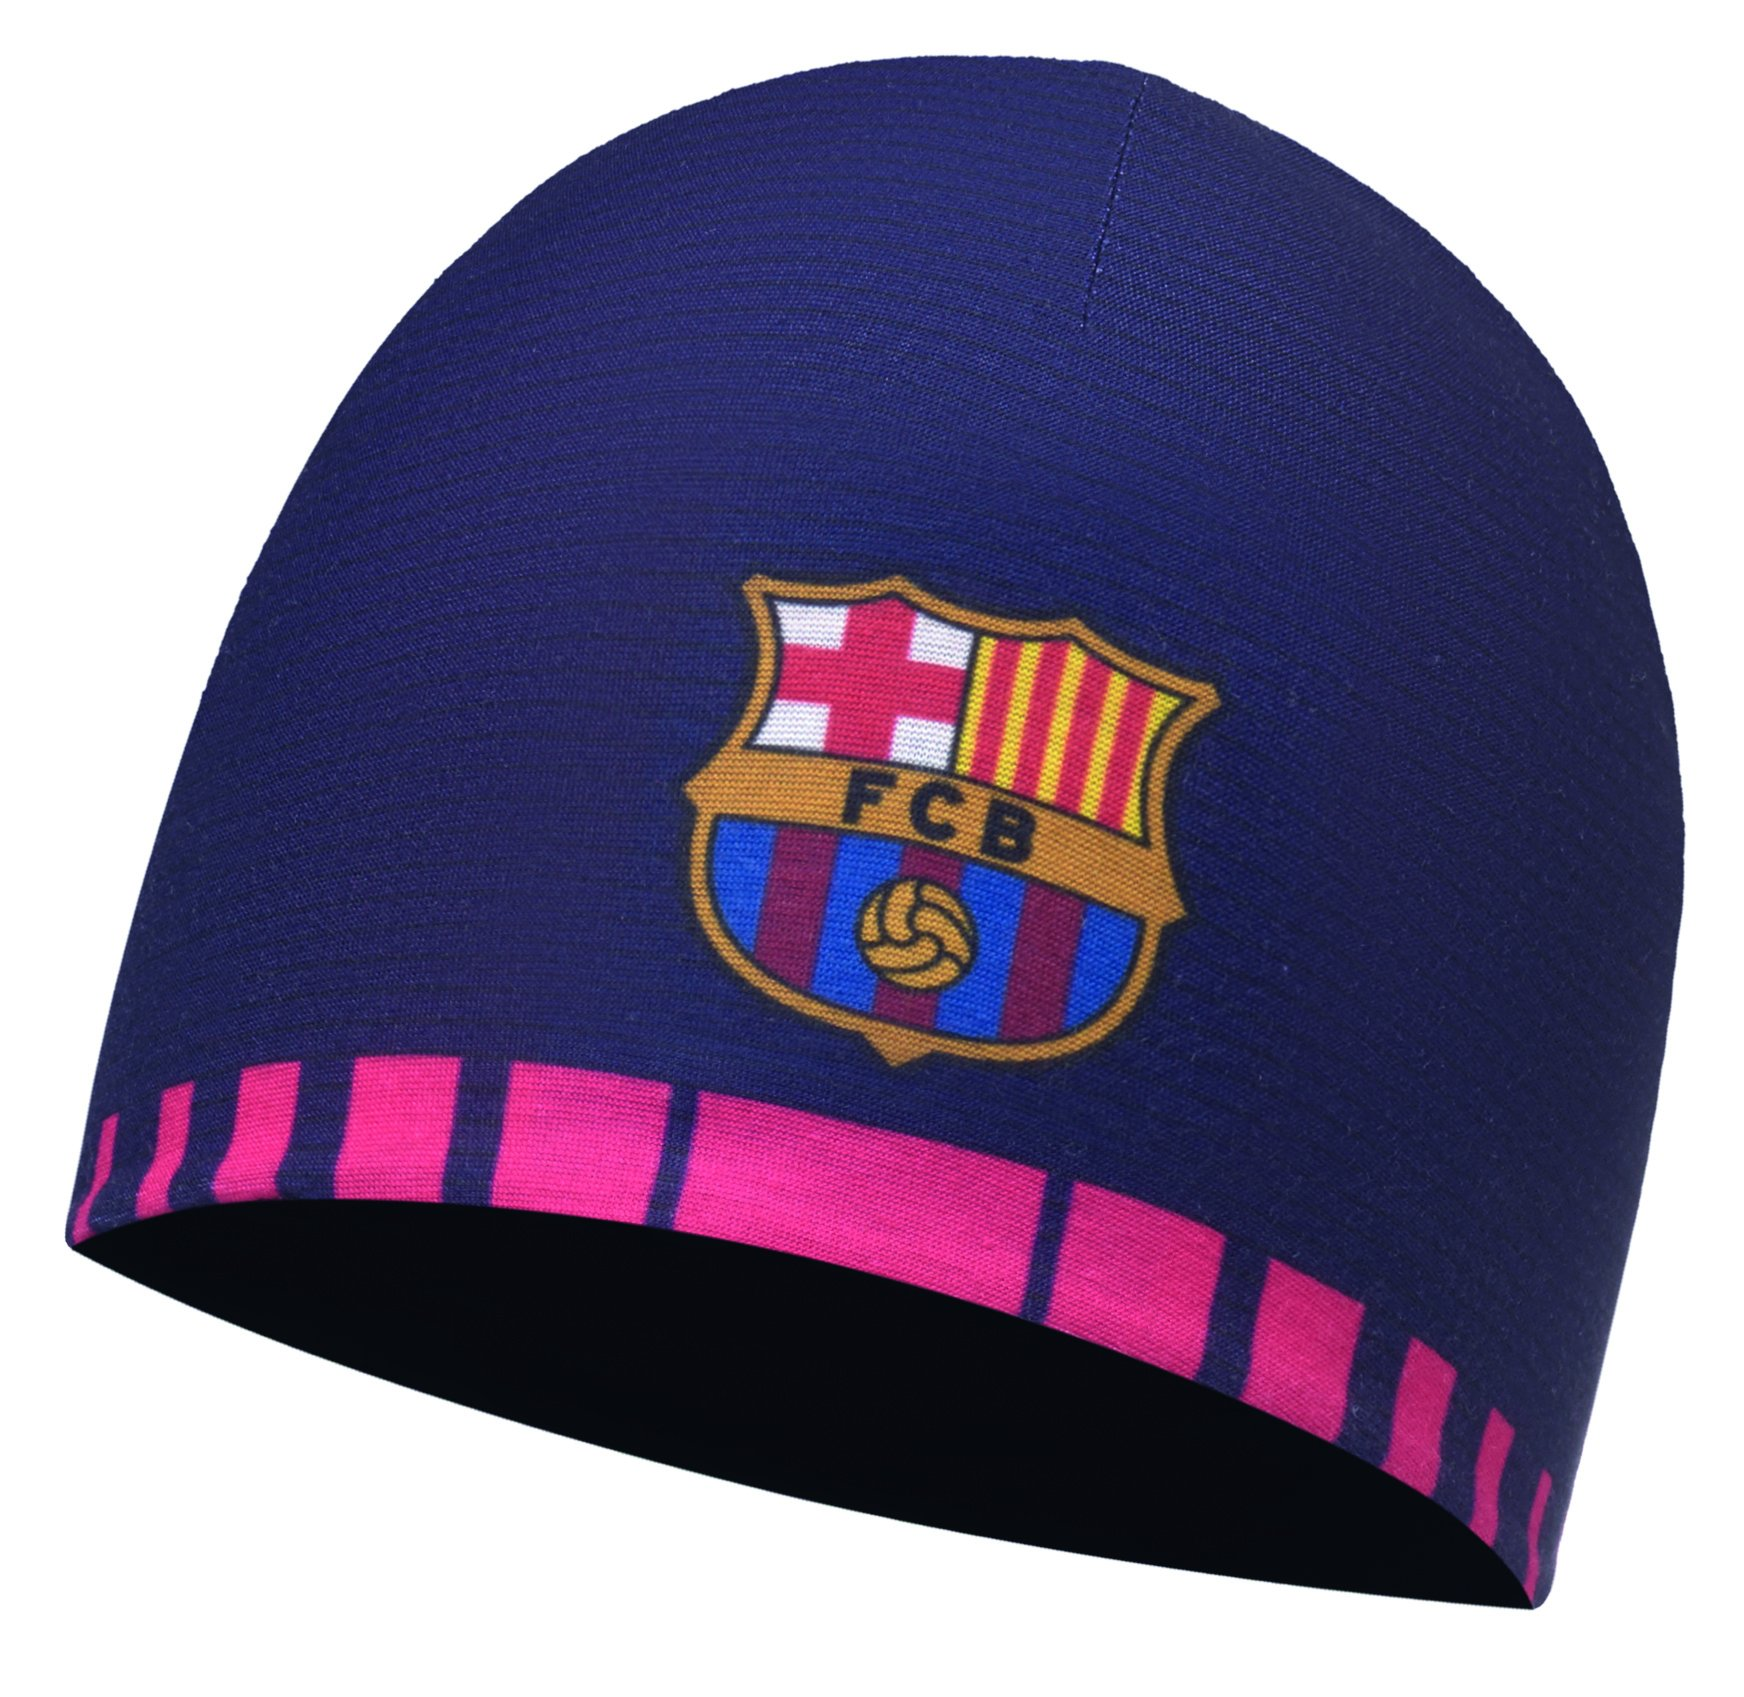 Buff Kinder Microfiber und Polar Hat FC Barcelona Mütze, 2Nd Equipment 16/17, O